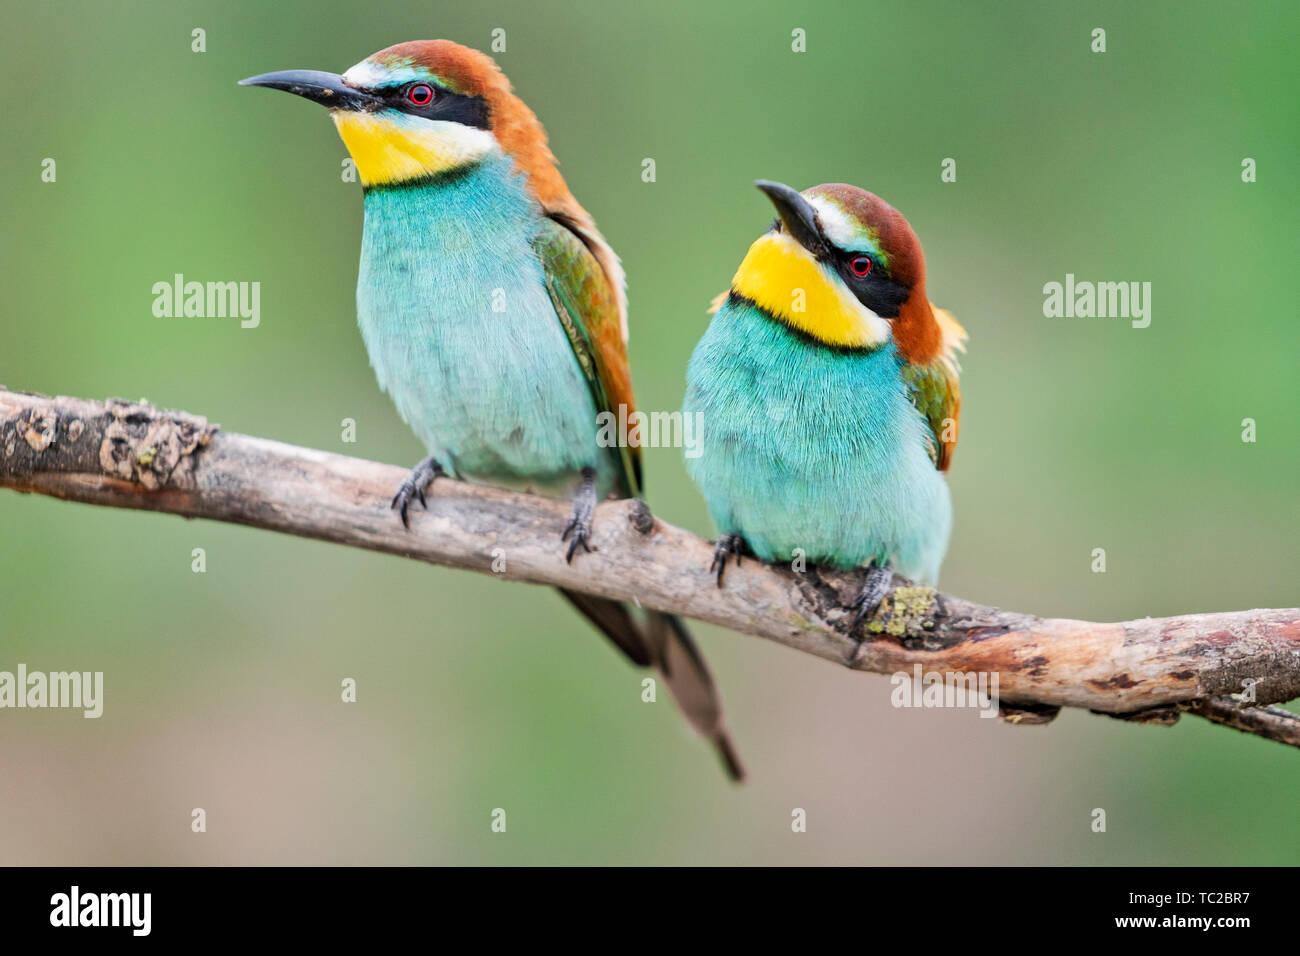 Pair Of Bright Cute Birds Sitting Near Stock Photo Alamy